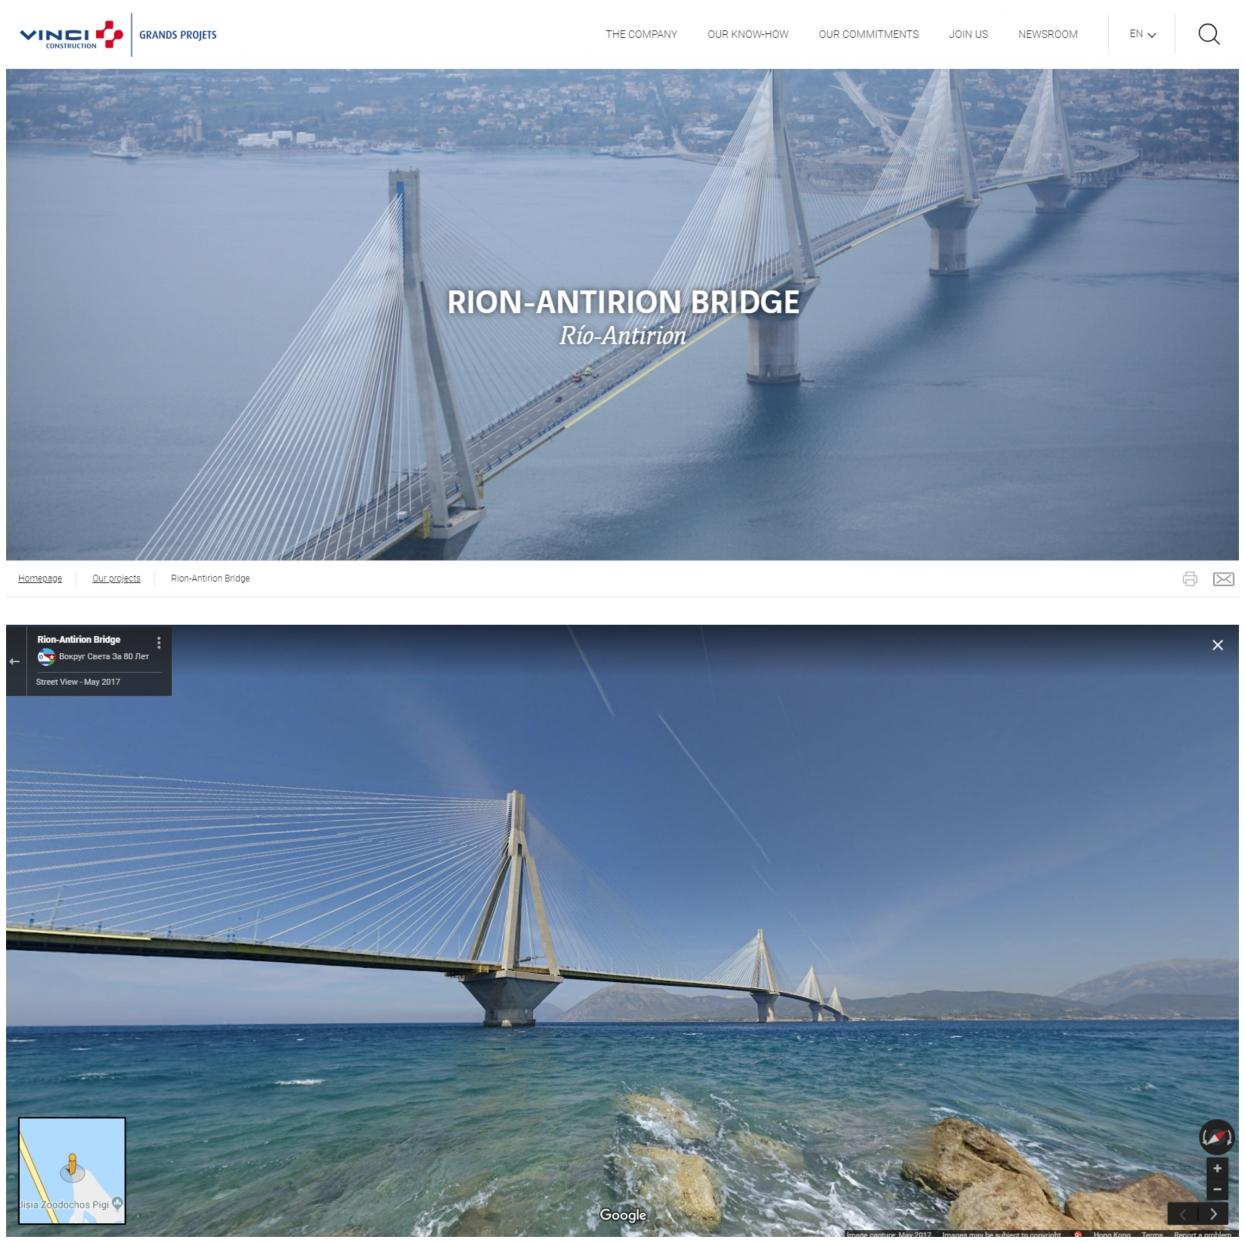 No, these photos do not show a bridge connecting Bohol and